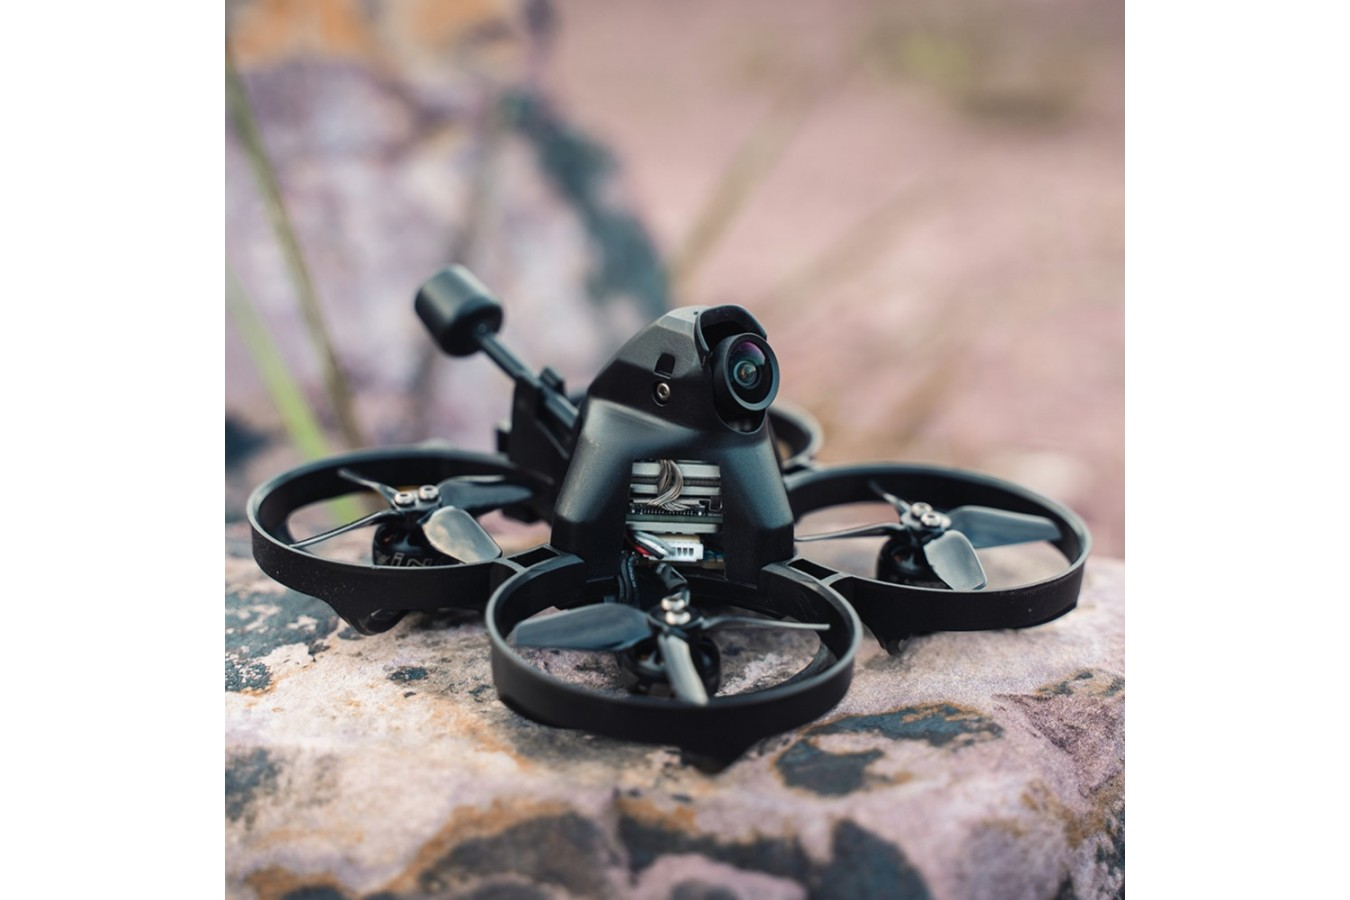 FPV Drone Training System